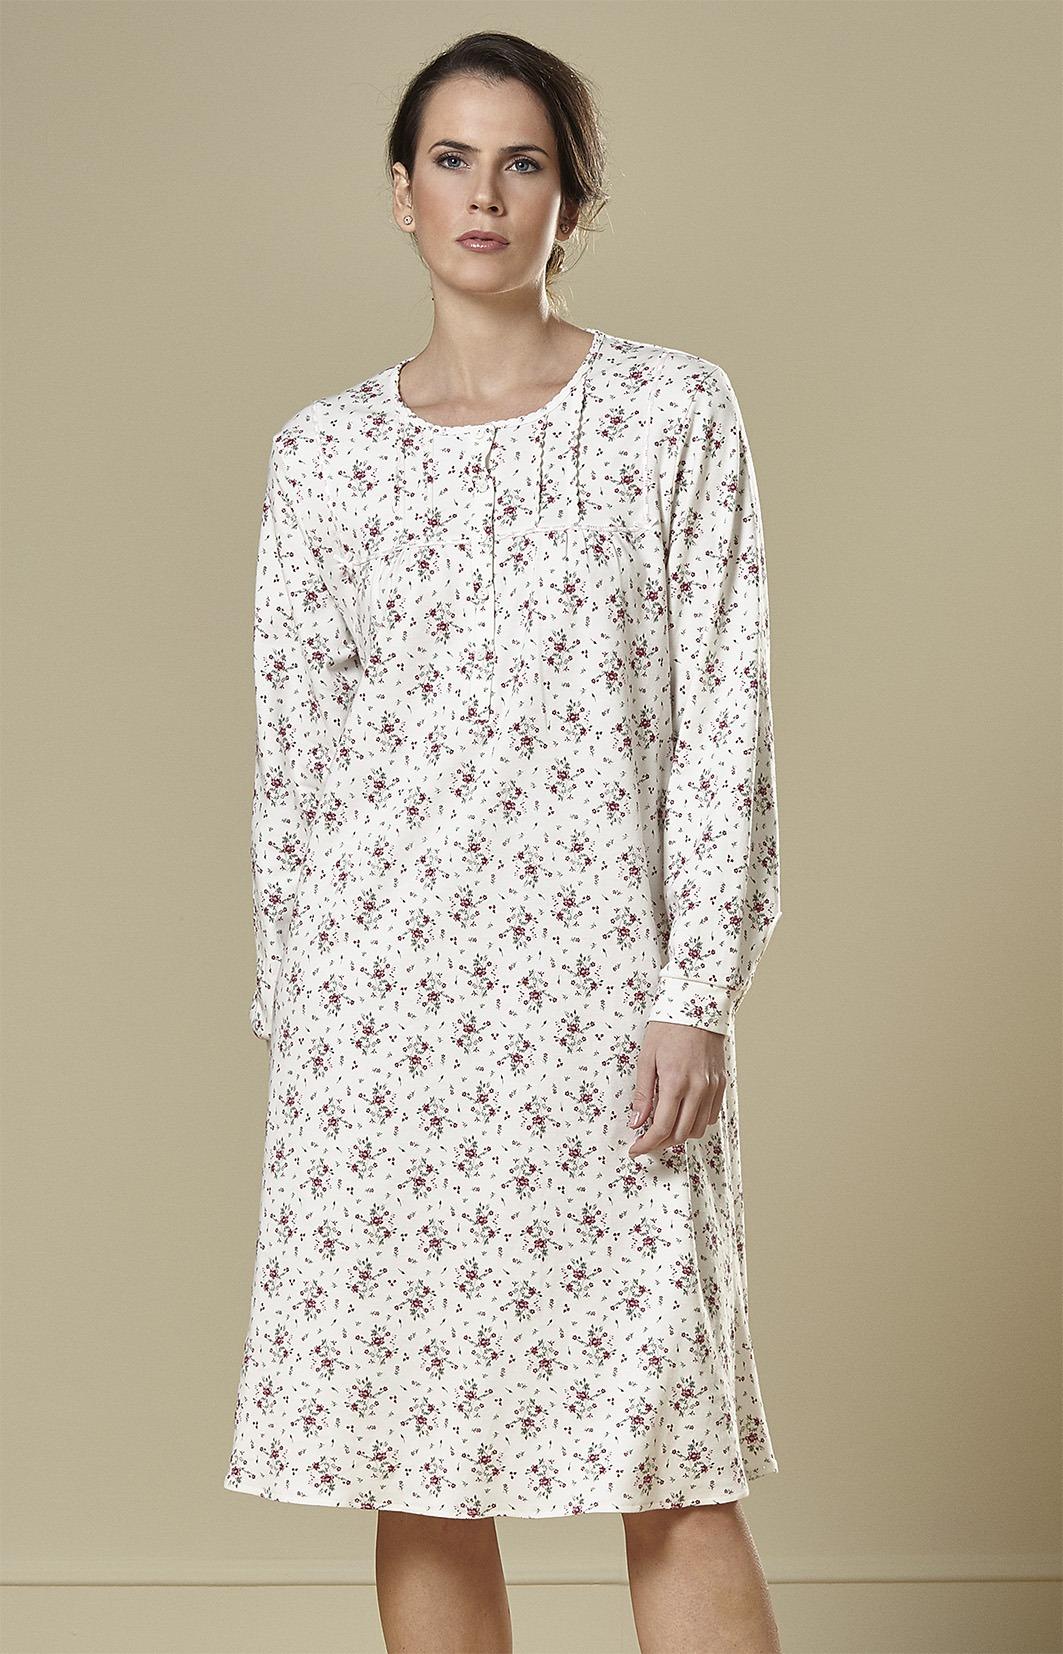 Camisón para mujer floral arabes